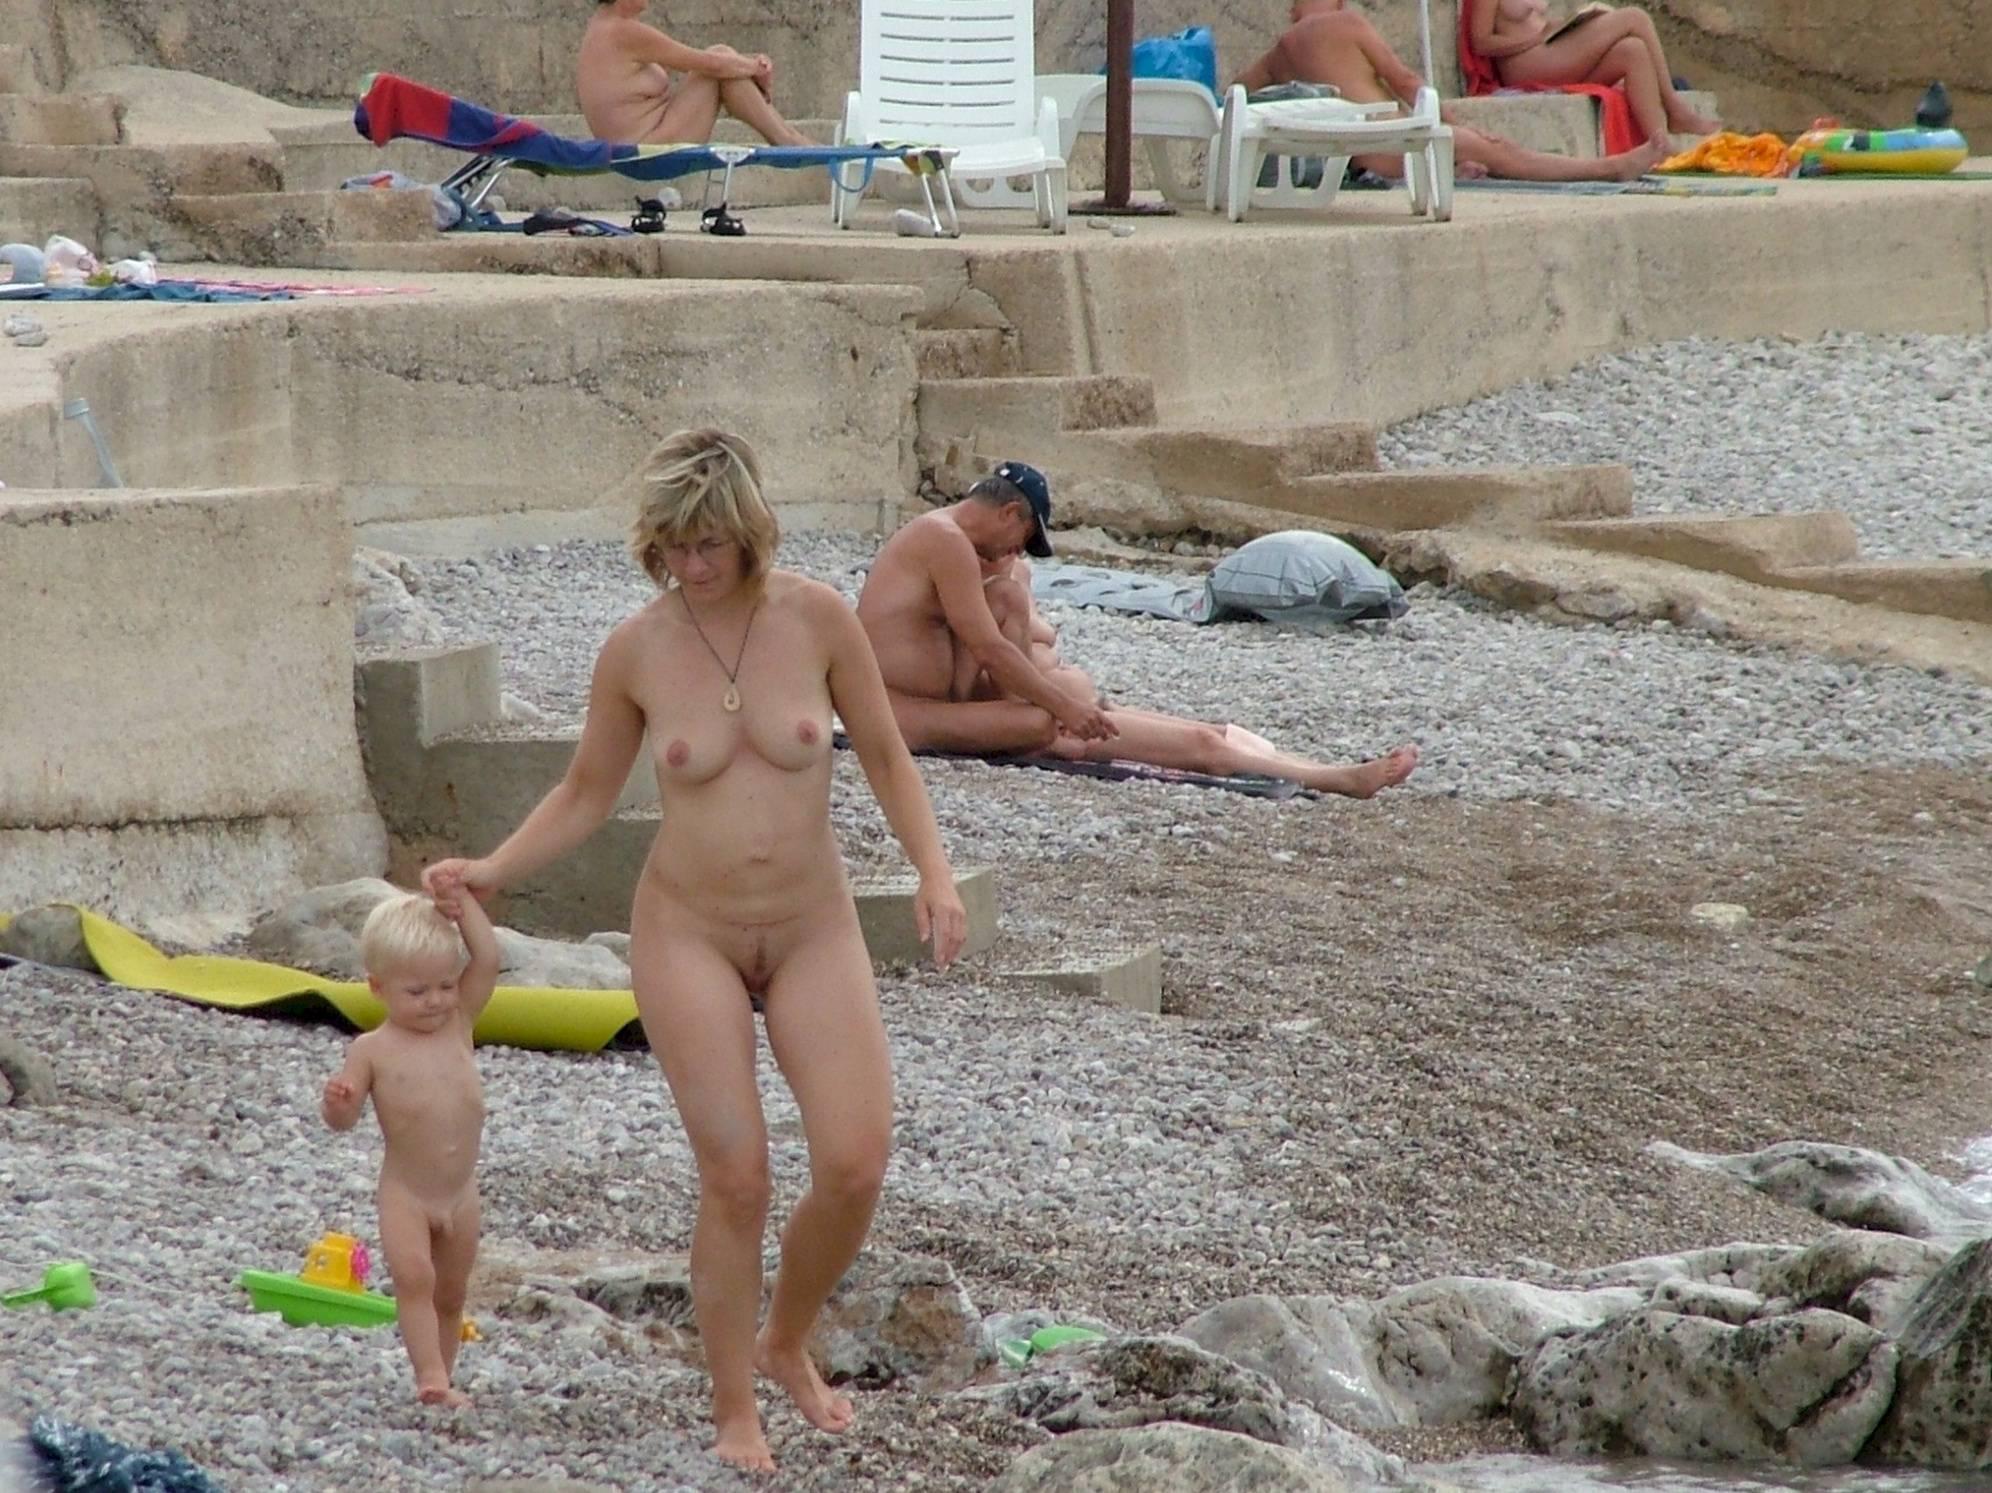 Pure Nudism Images FKK Europe Rock Shoreline - 1